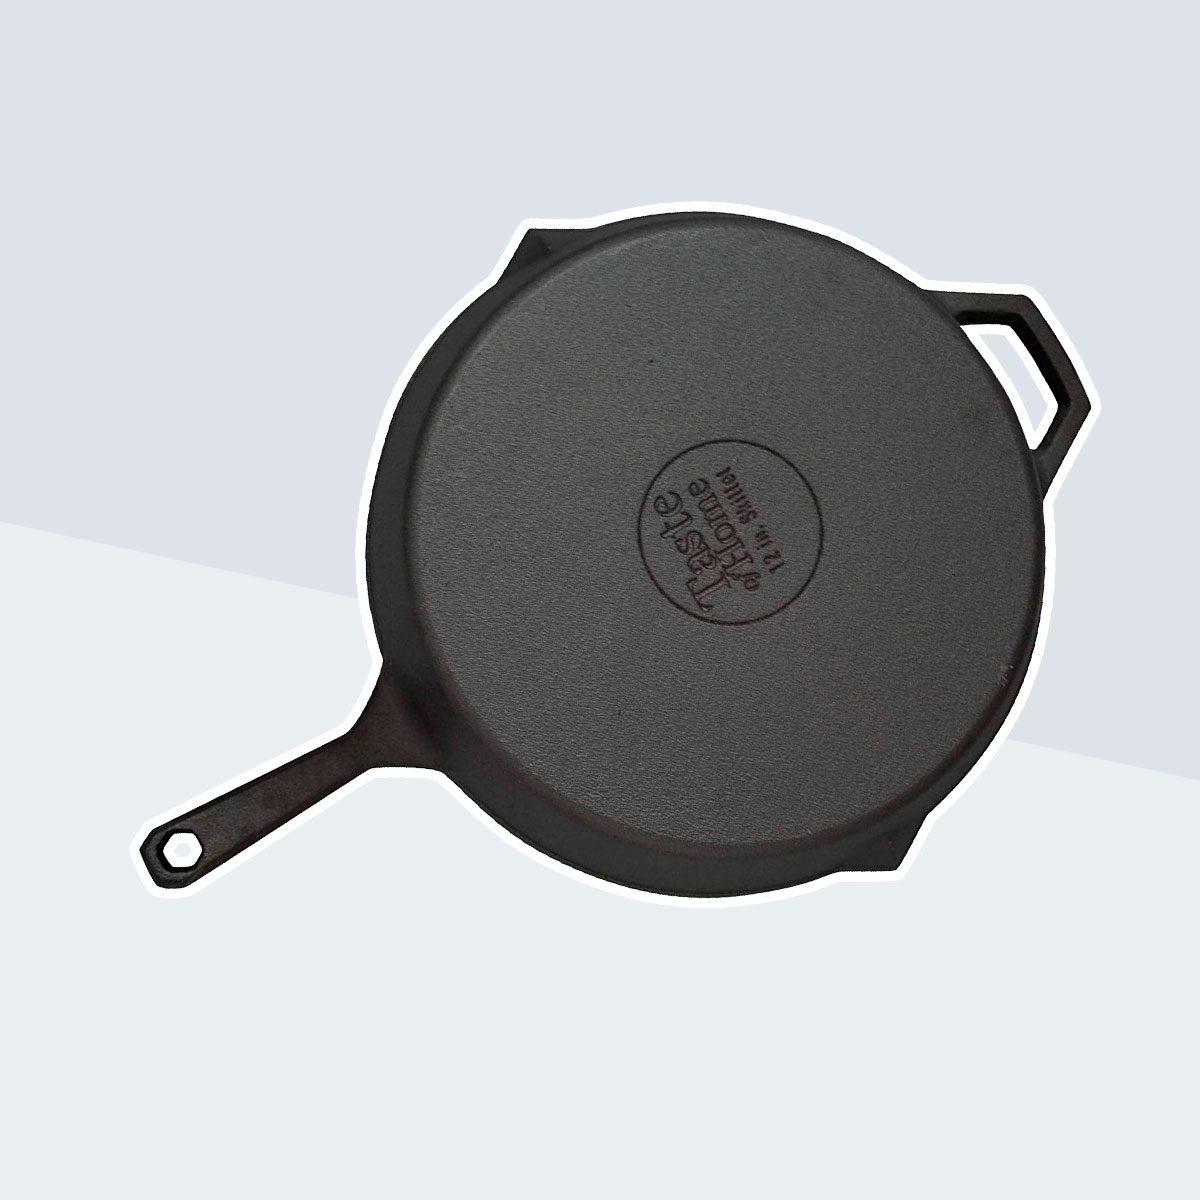 Taste of Home 12-inch Pre-Seasoned Cast Iron Skillet